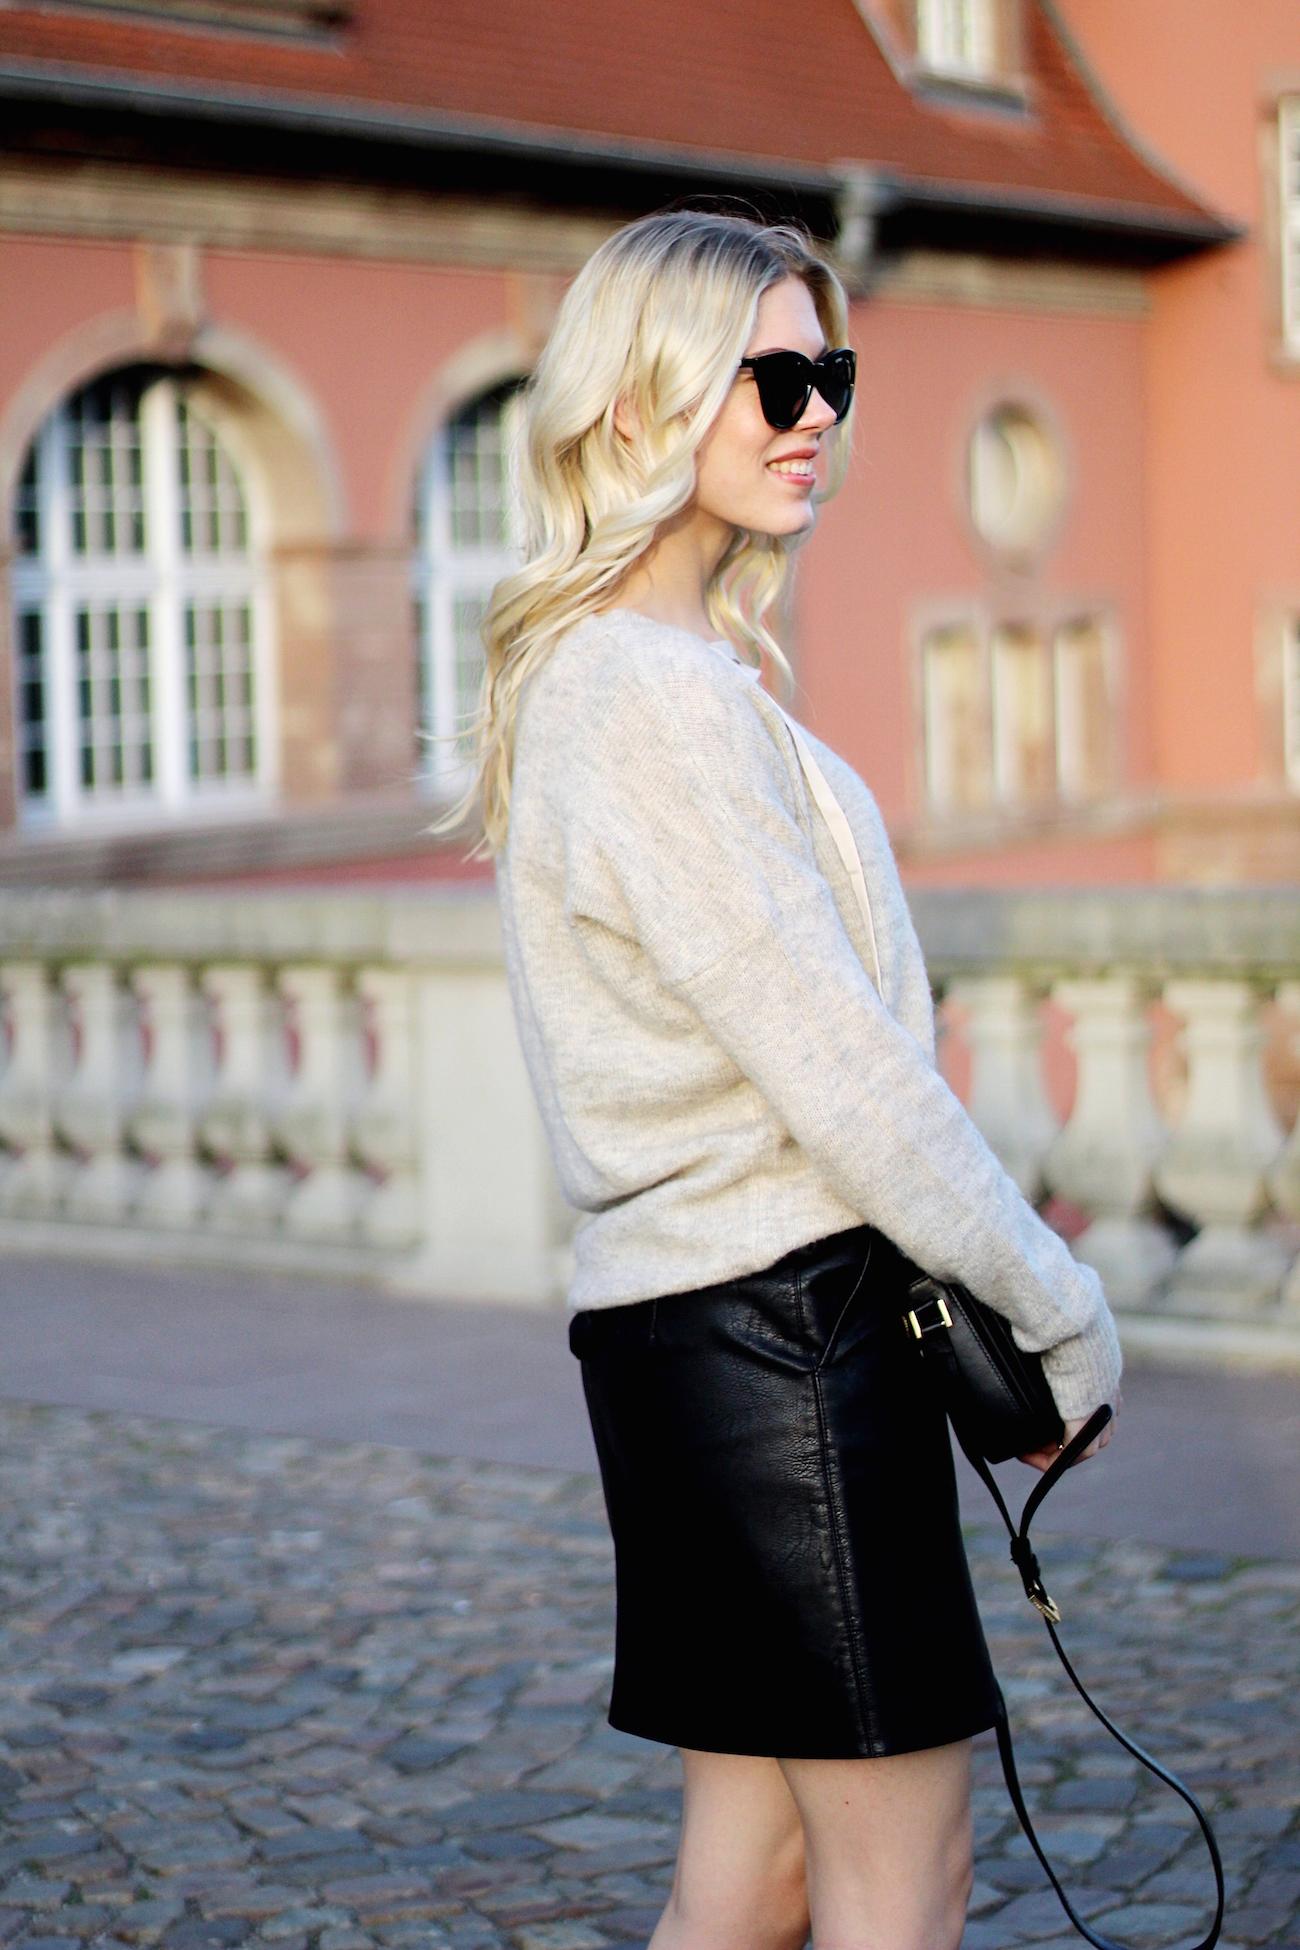 lace-up-sweater-Zara-skirt-Strasbourg-H&M-slipper8